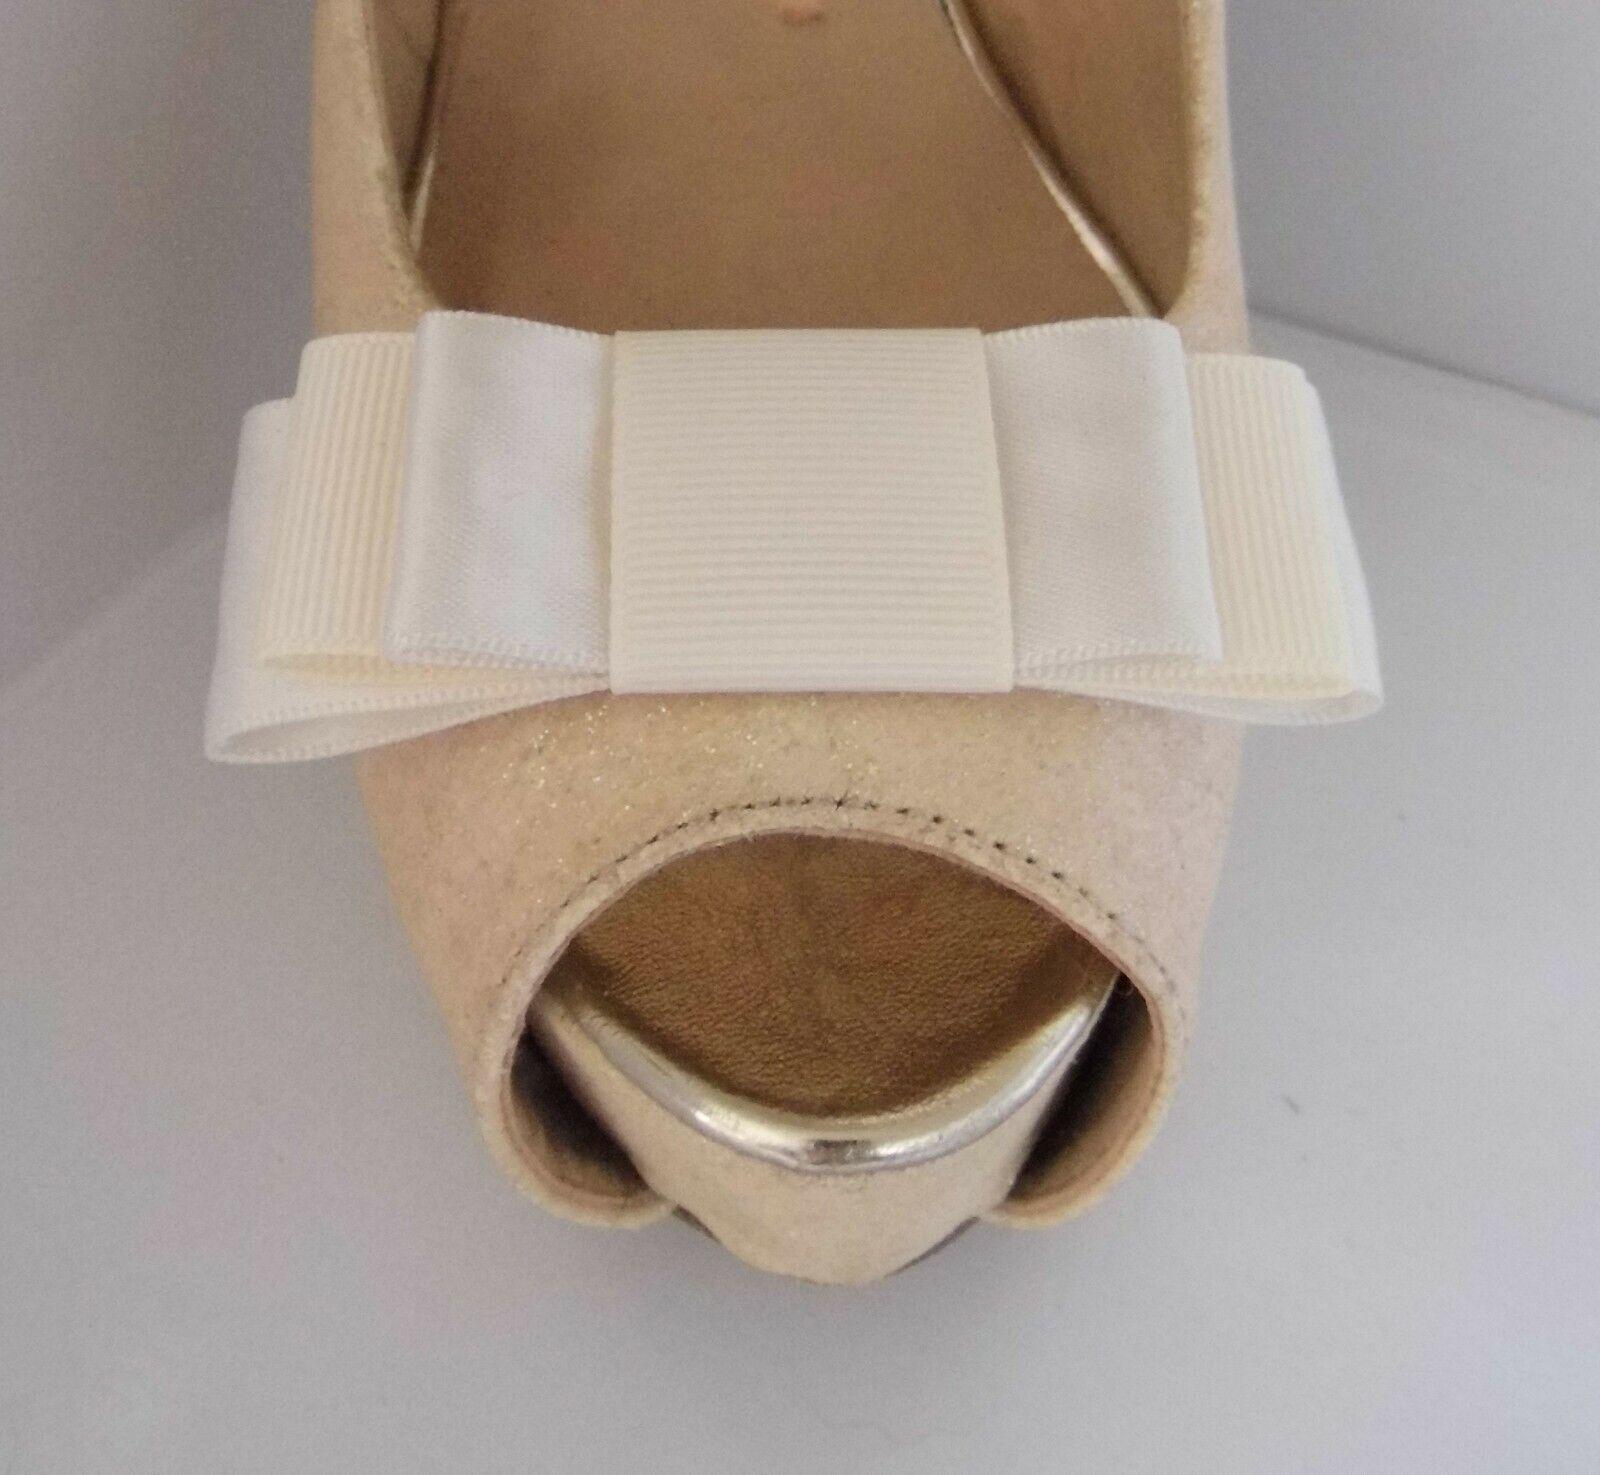 2 Handmade Ivory Satin & Grosgrain Triple Bow Shoe Clips